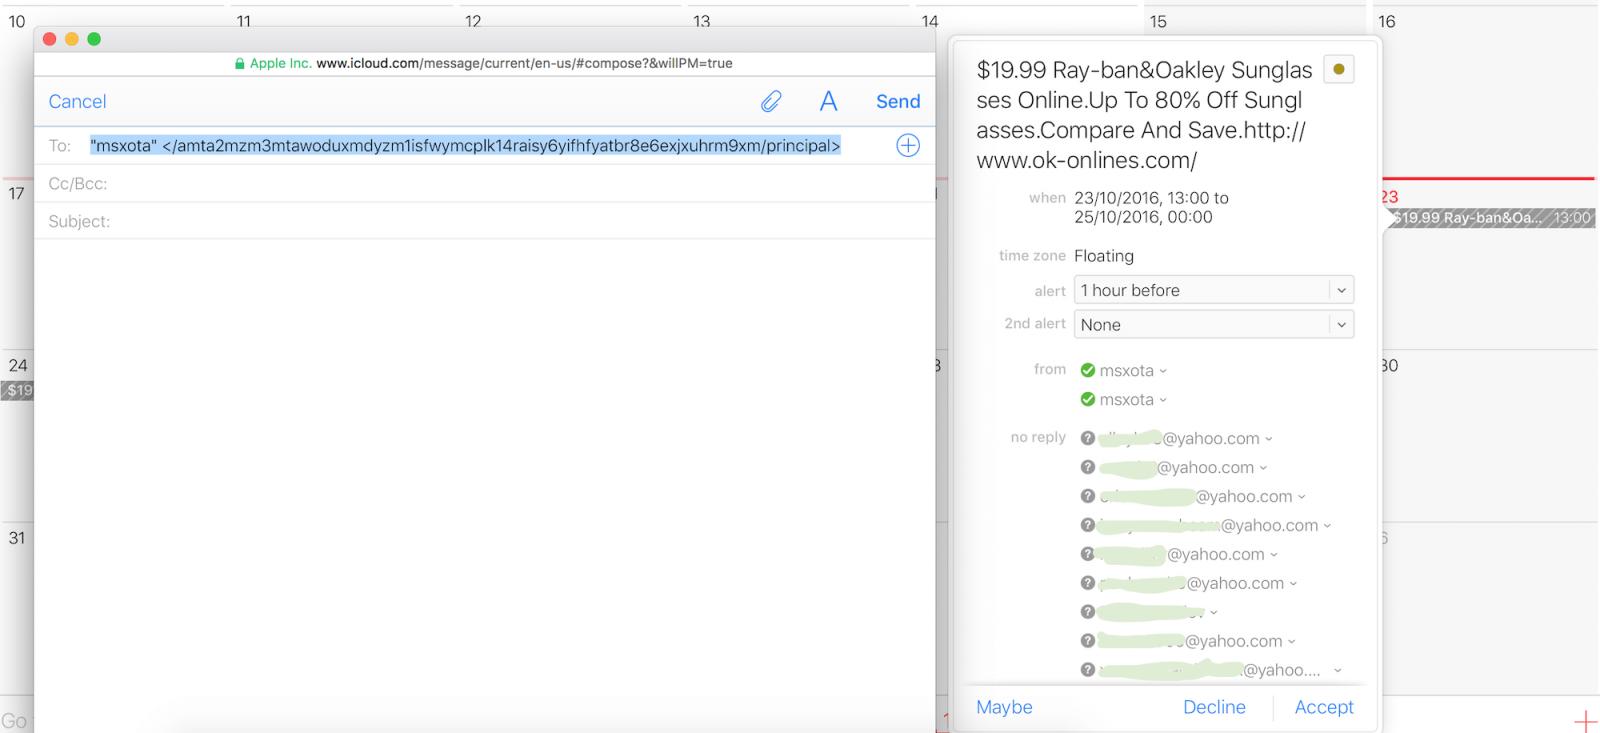 Icloud Calendar.Apple Users Bombarded By Icloud Calendar Spam